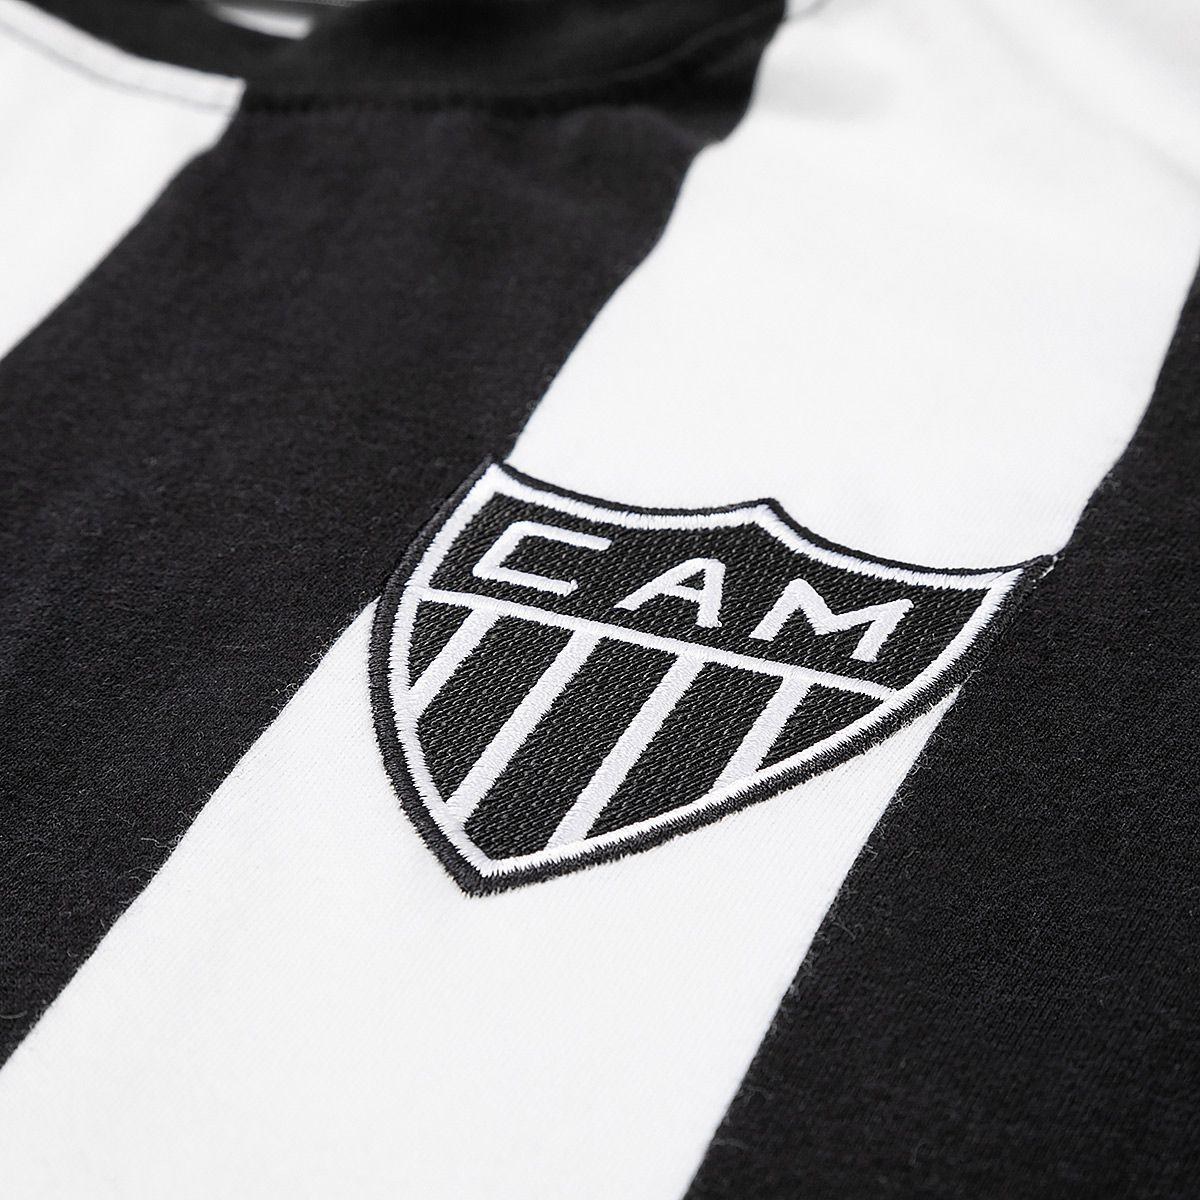 Camisa Atlético Mineiro Retrô 1971